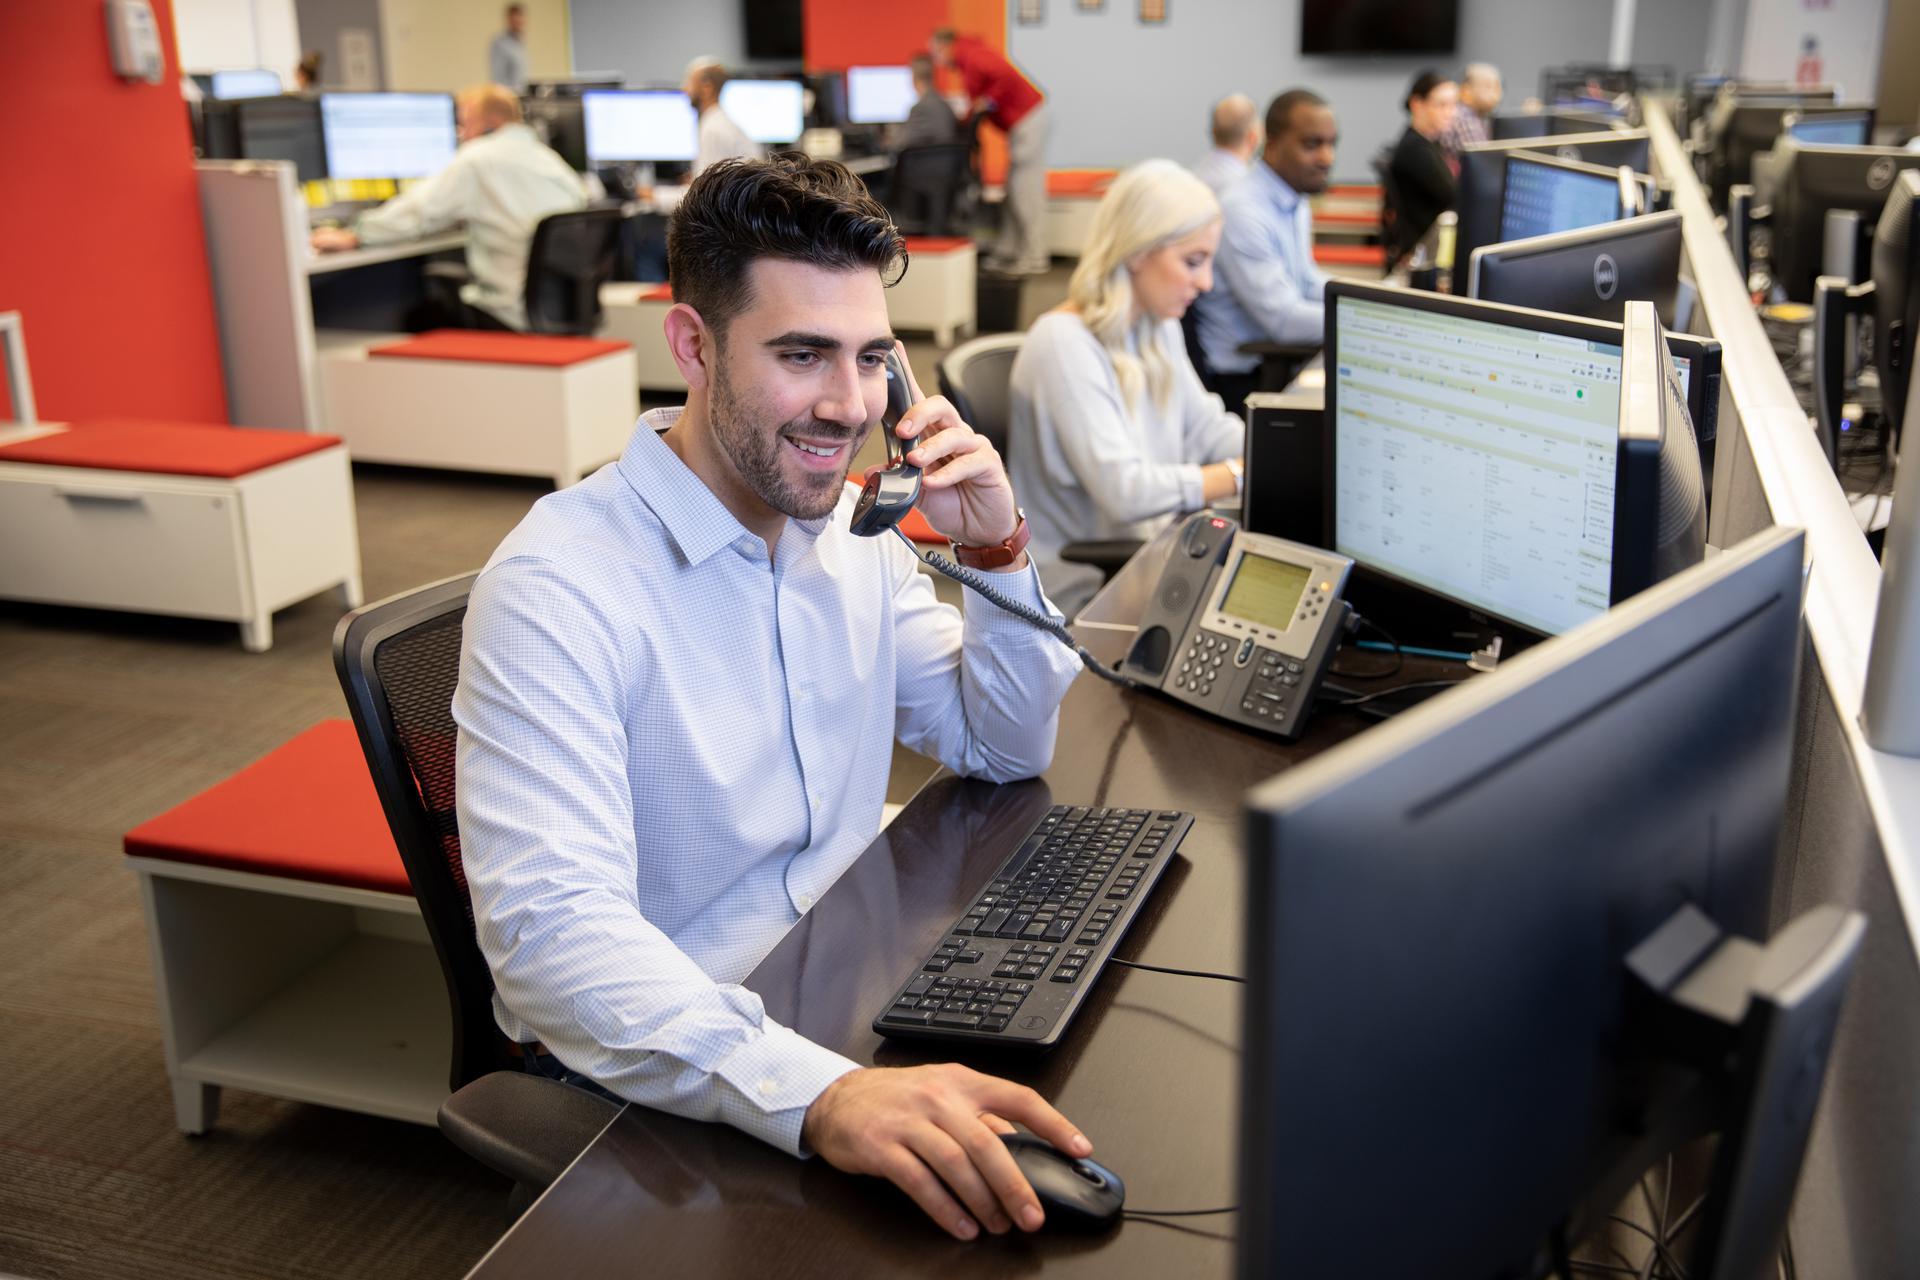 XPO Employee Checking